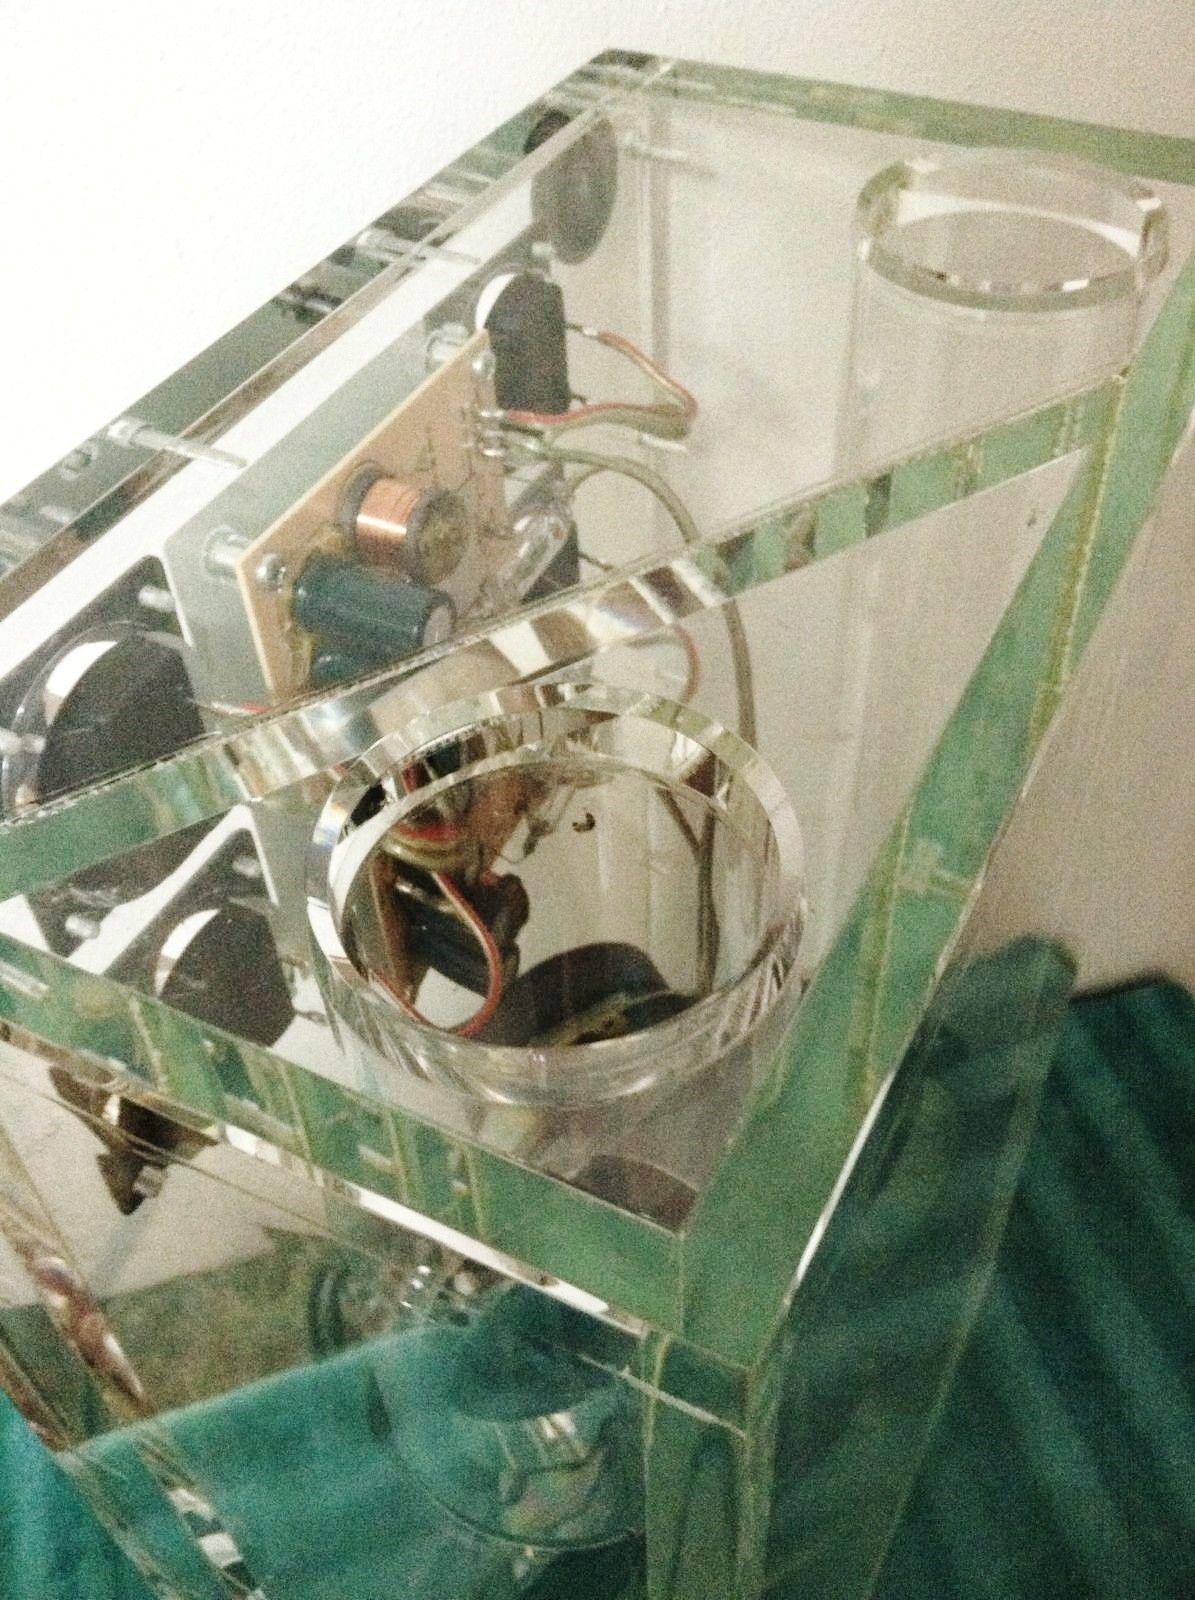 Bose Acoustimass AM-5 SE-5 501X 5 Series I inside - What\'s Inside